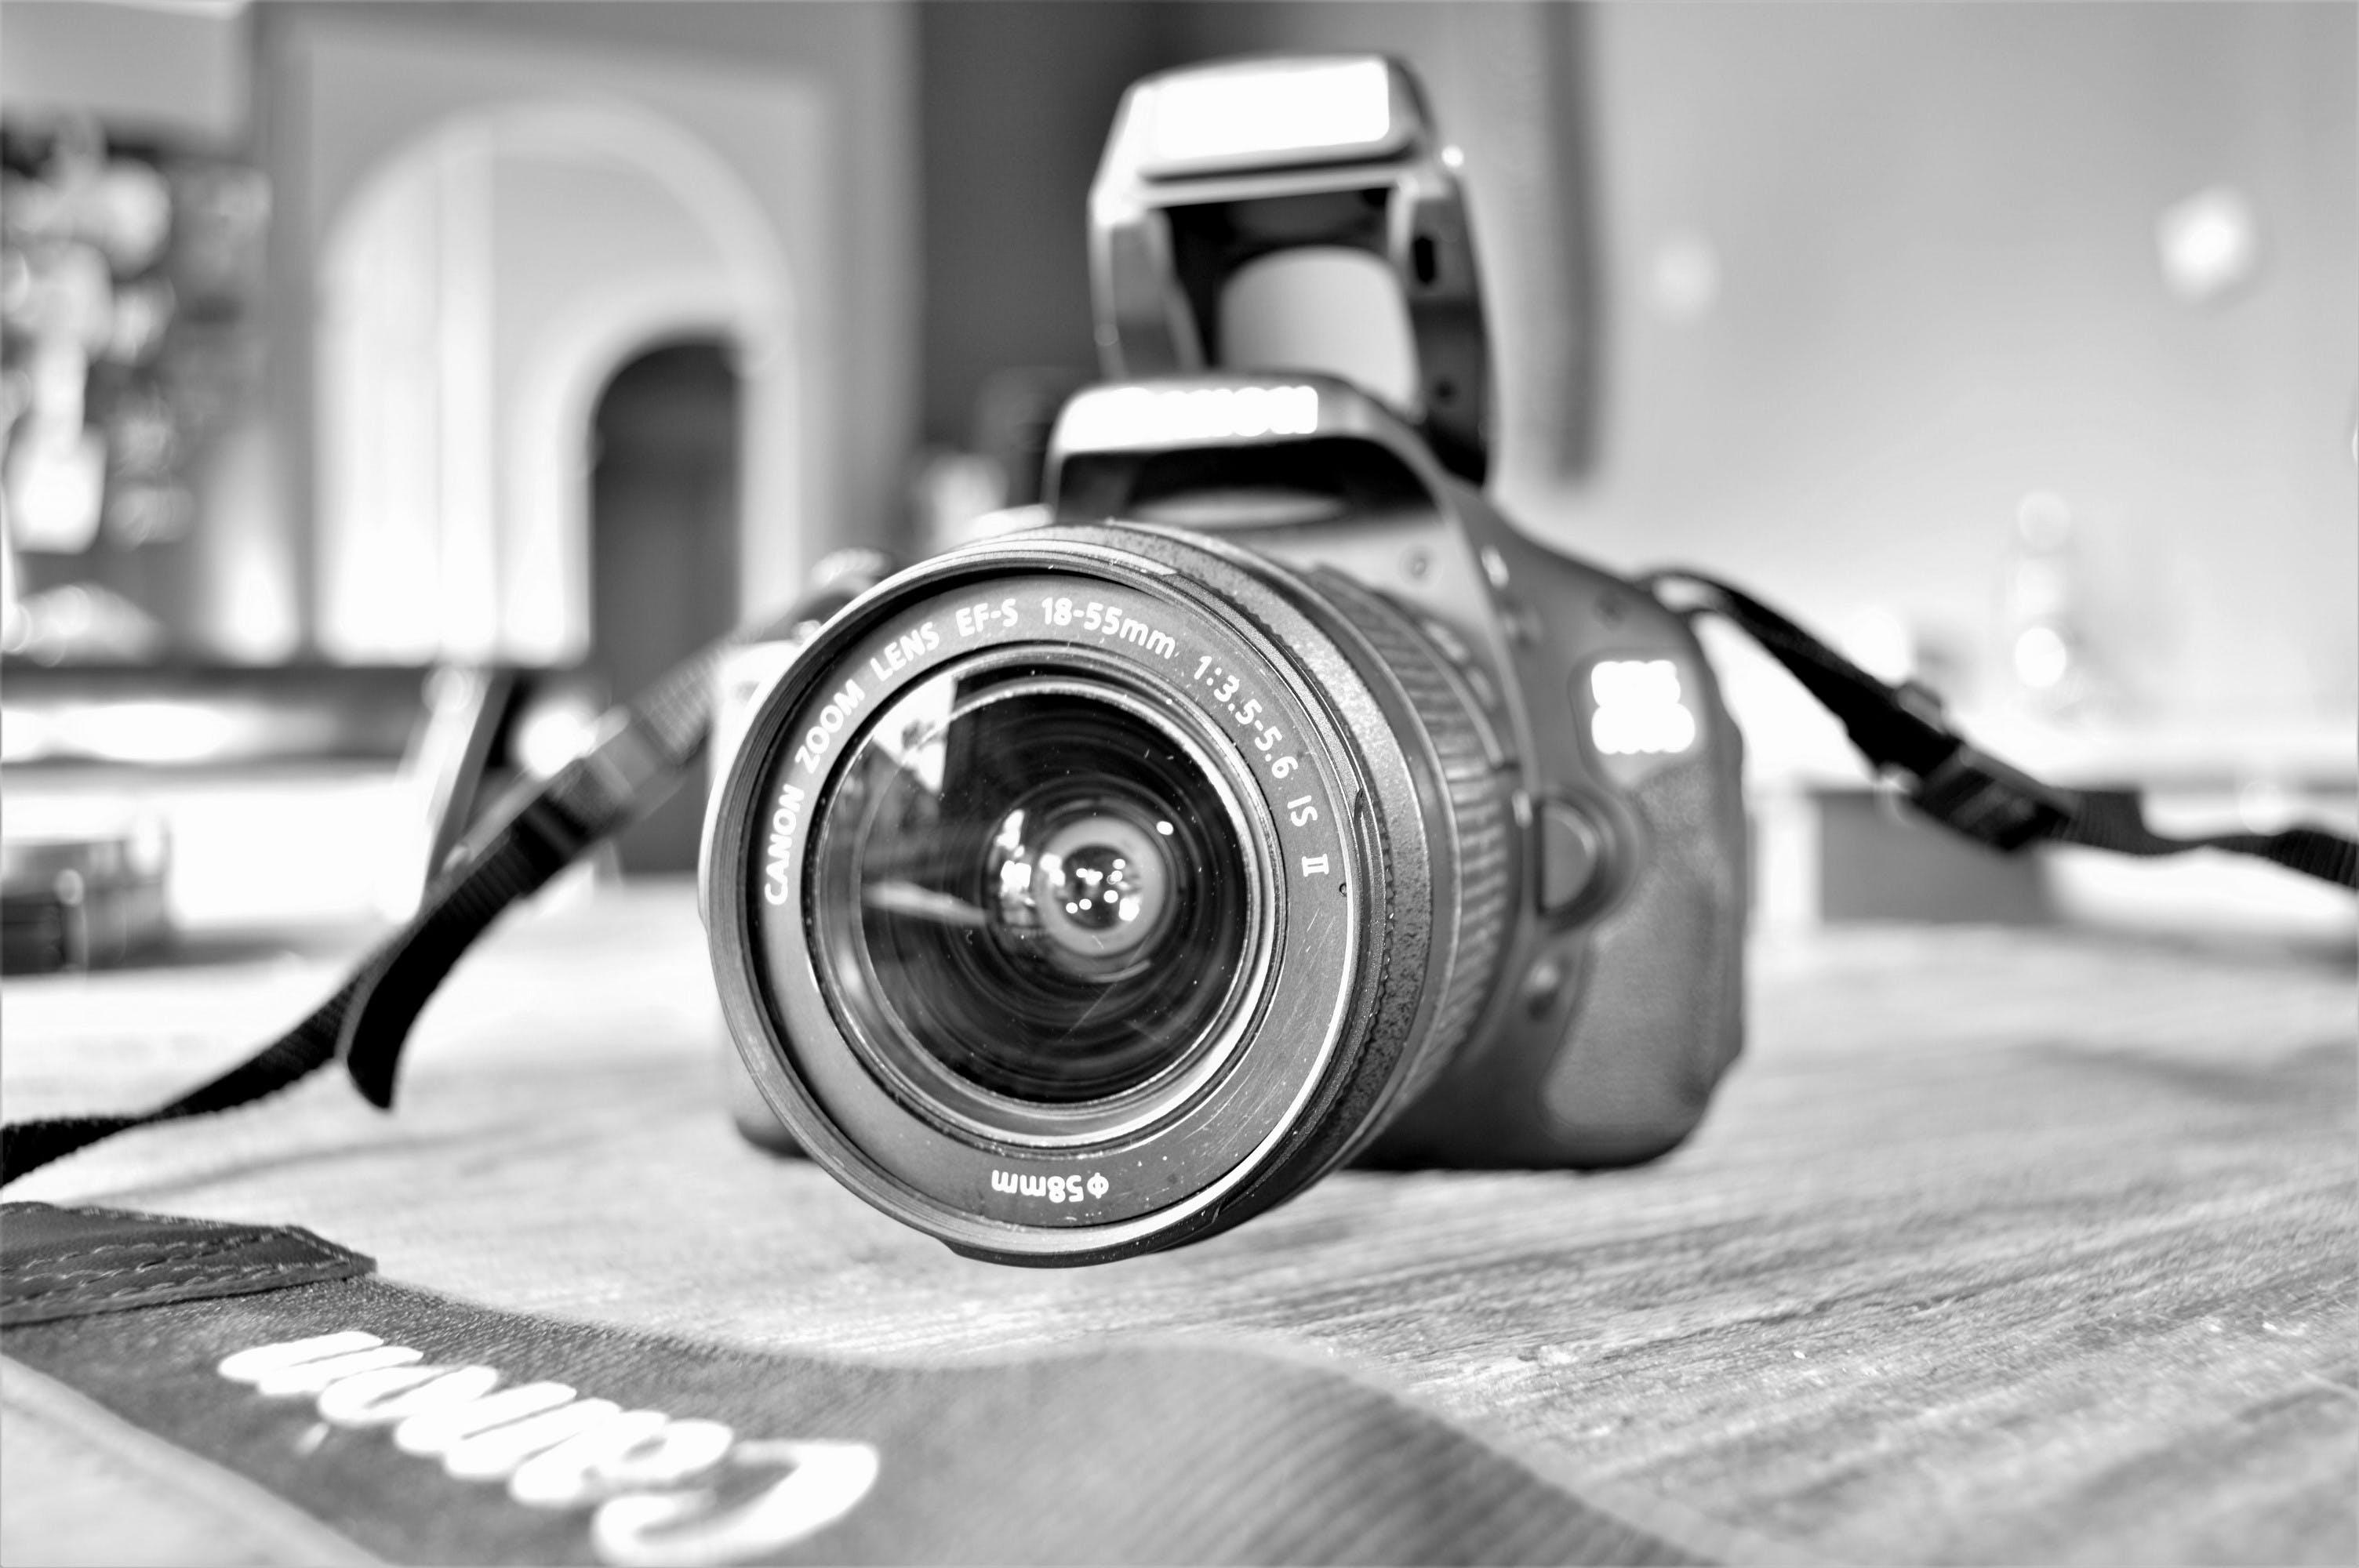 Free stock photo of camera, table, inside, canon